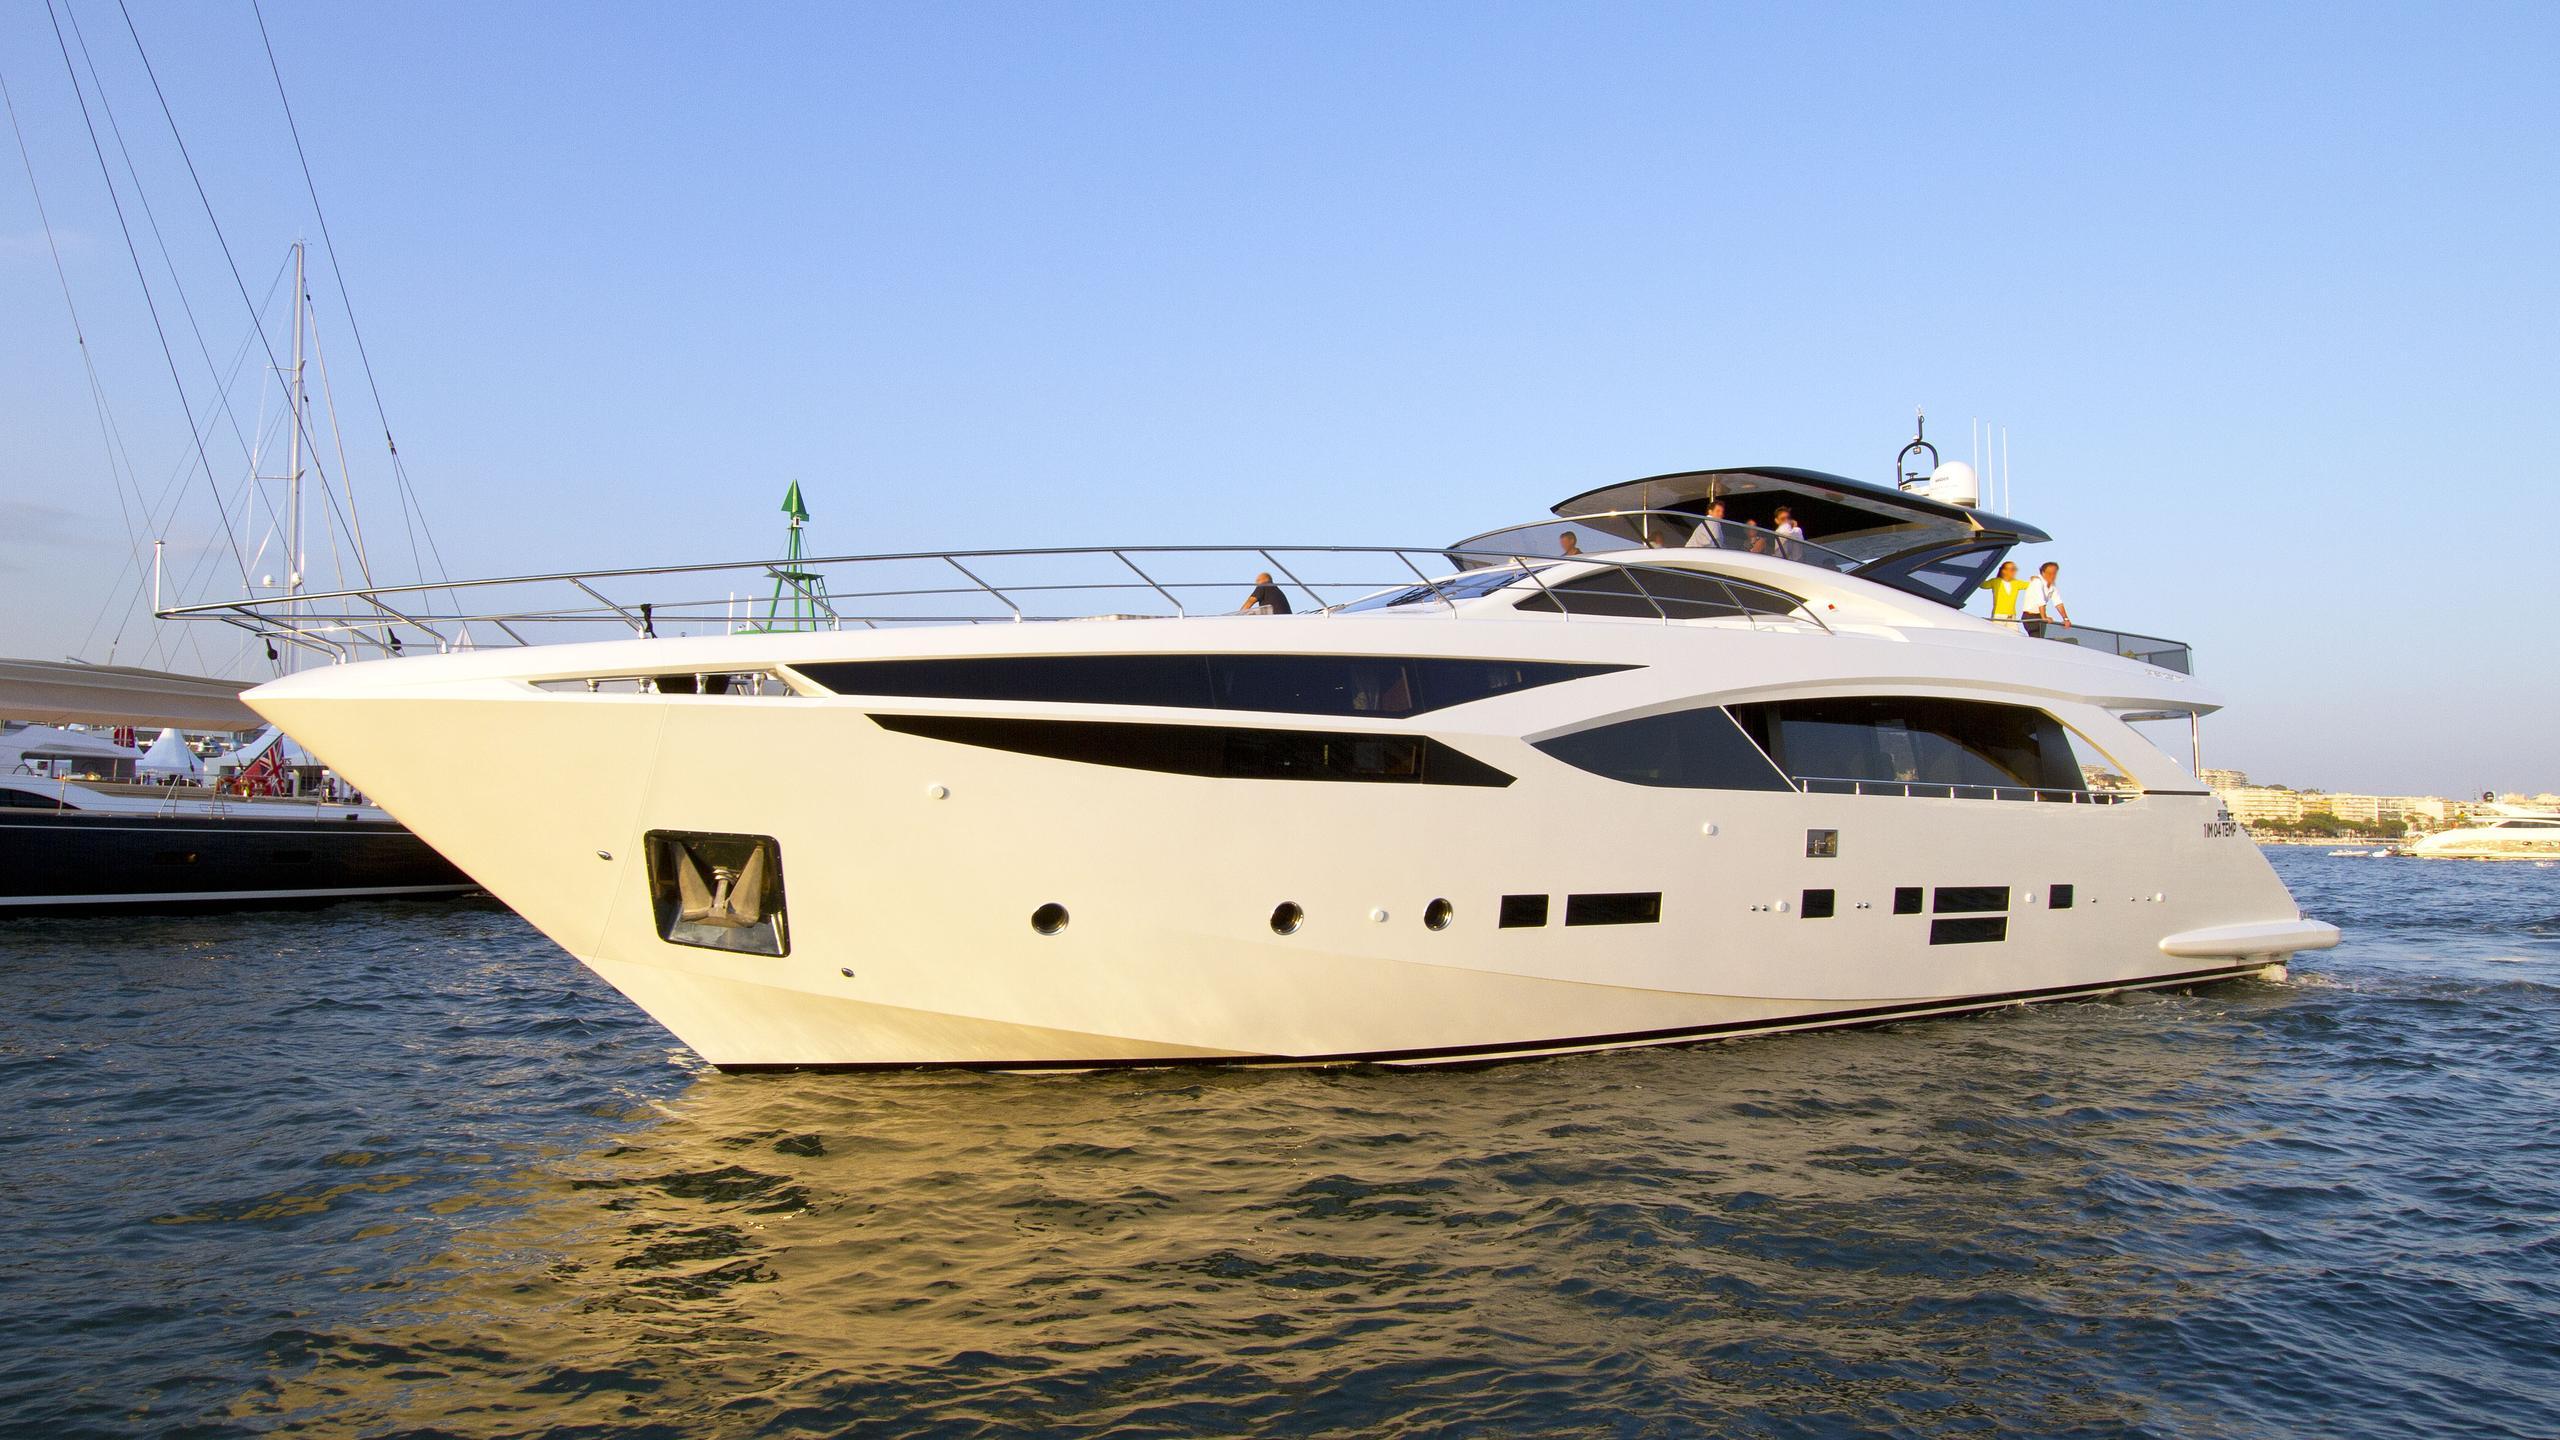 amer cento quad motoryacht permare 2016 30m half profile